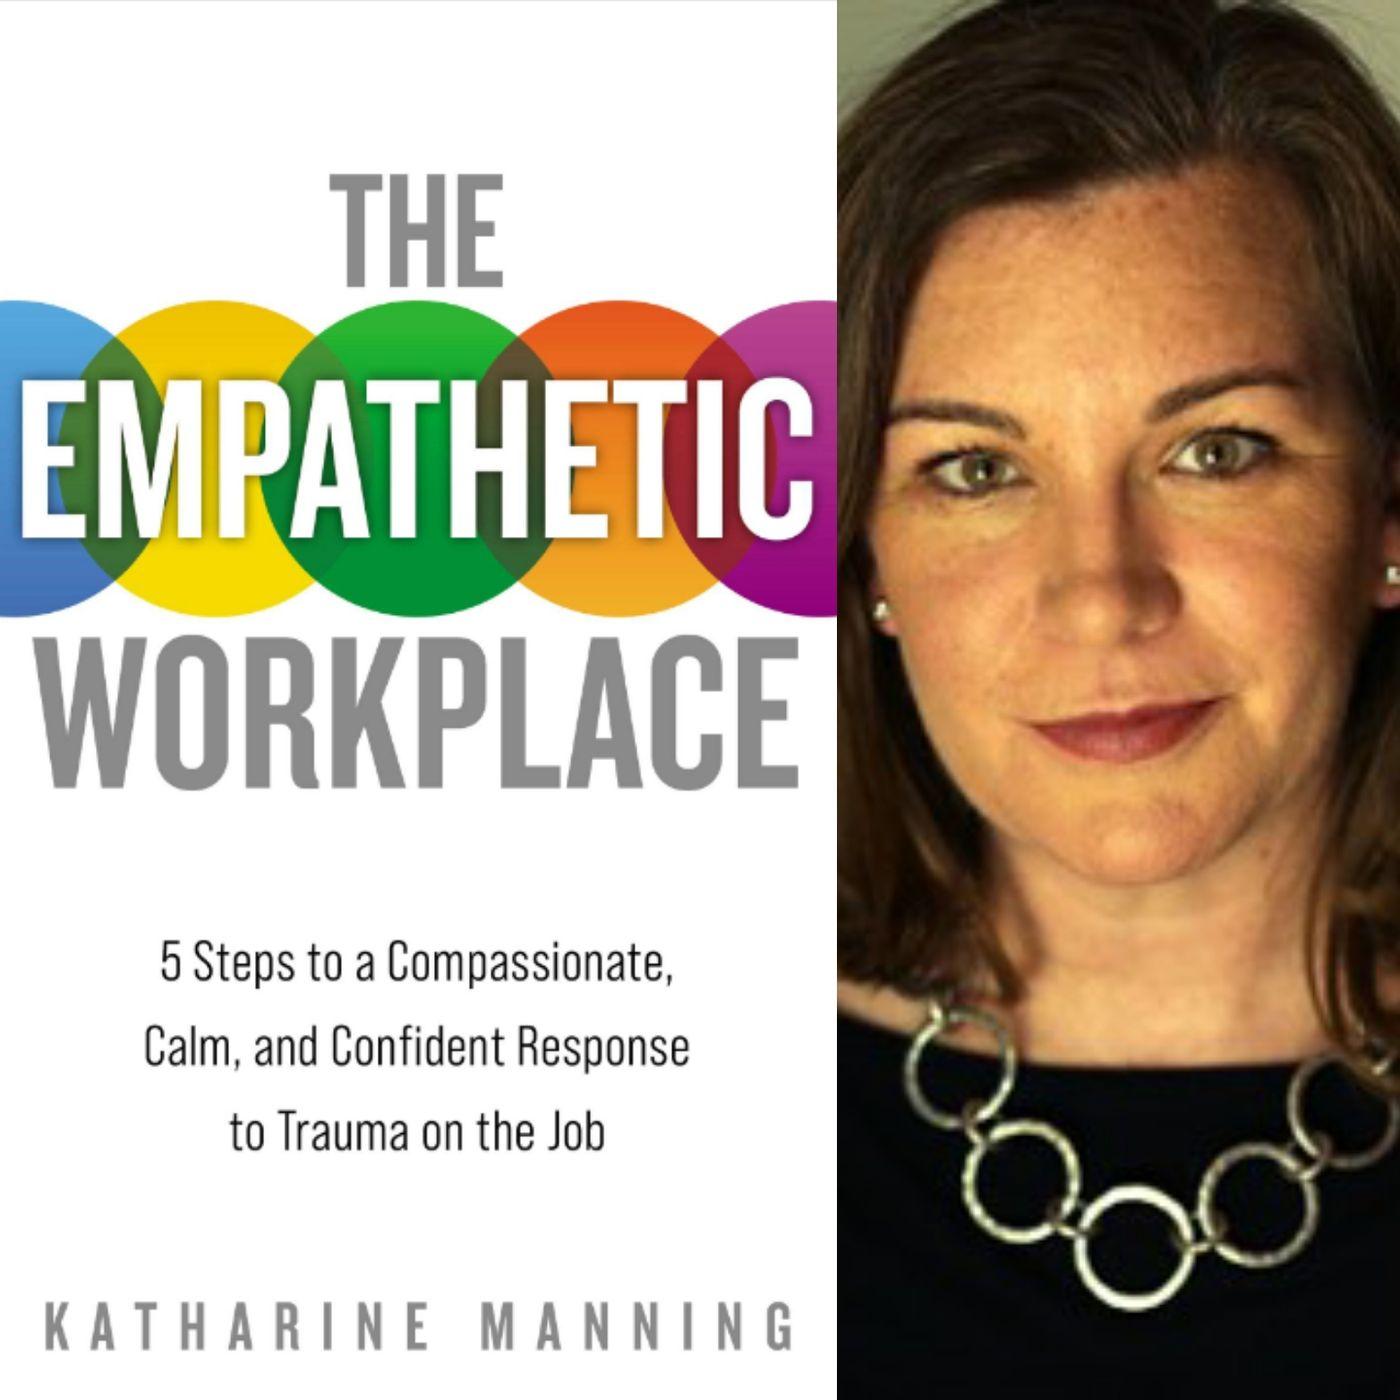 The Empathetic Workplace - Katharine Manning on Big Blend Radio